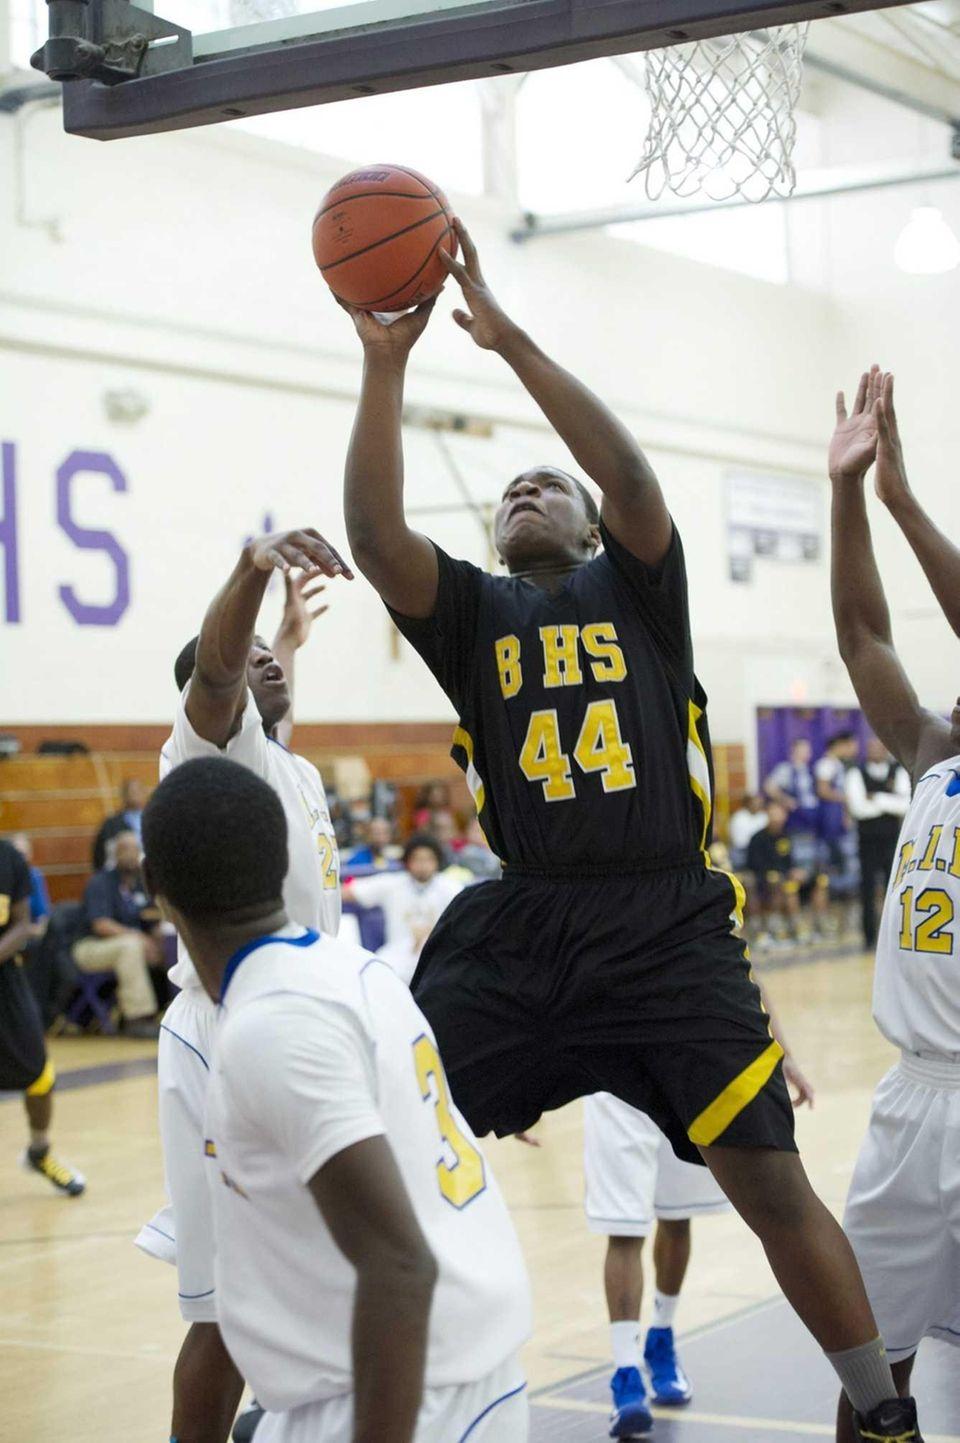 Joshua Lamison of Bridgehampton drives to the basket